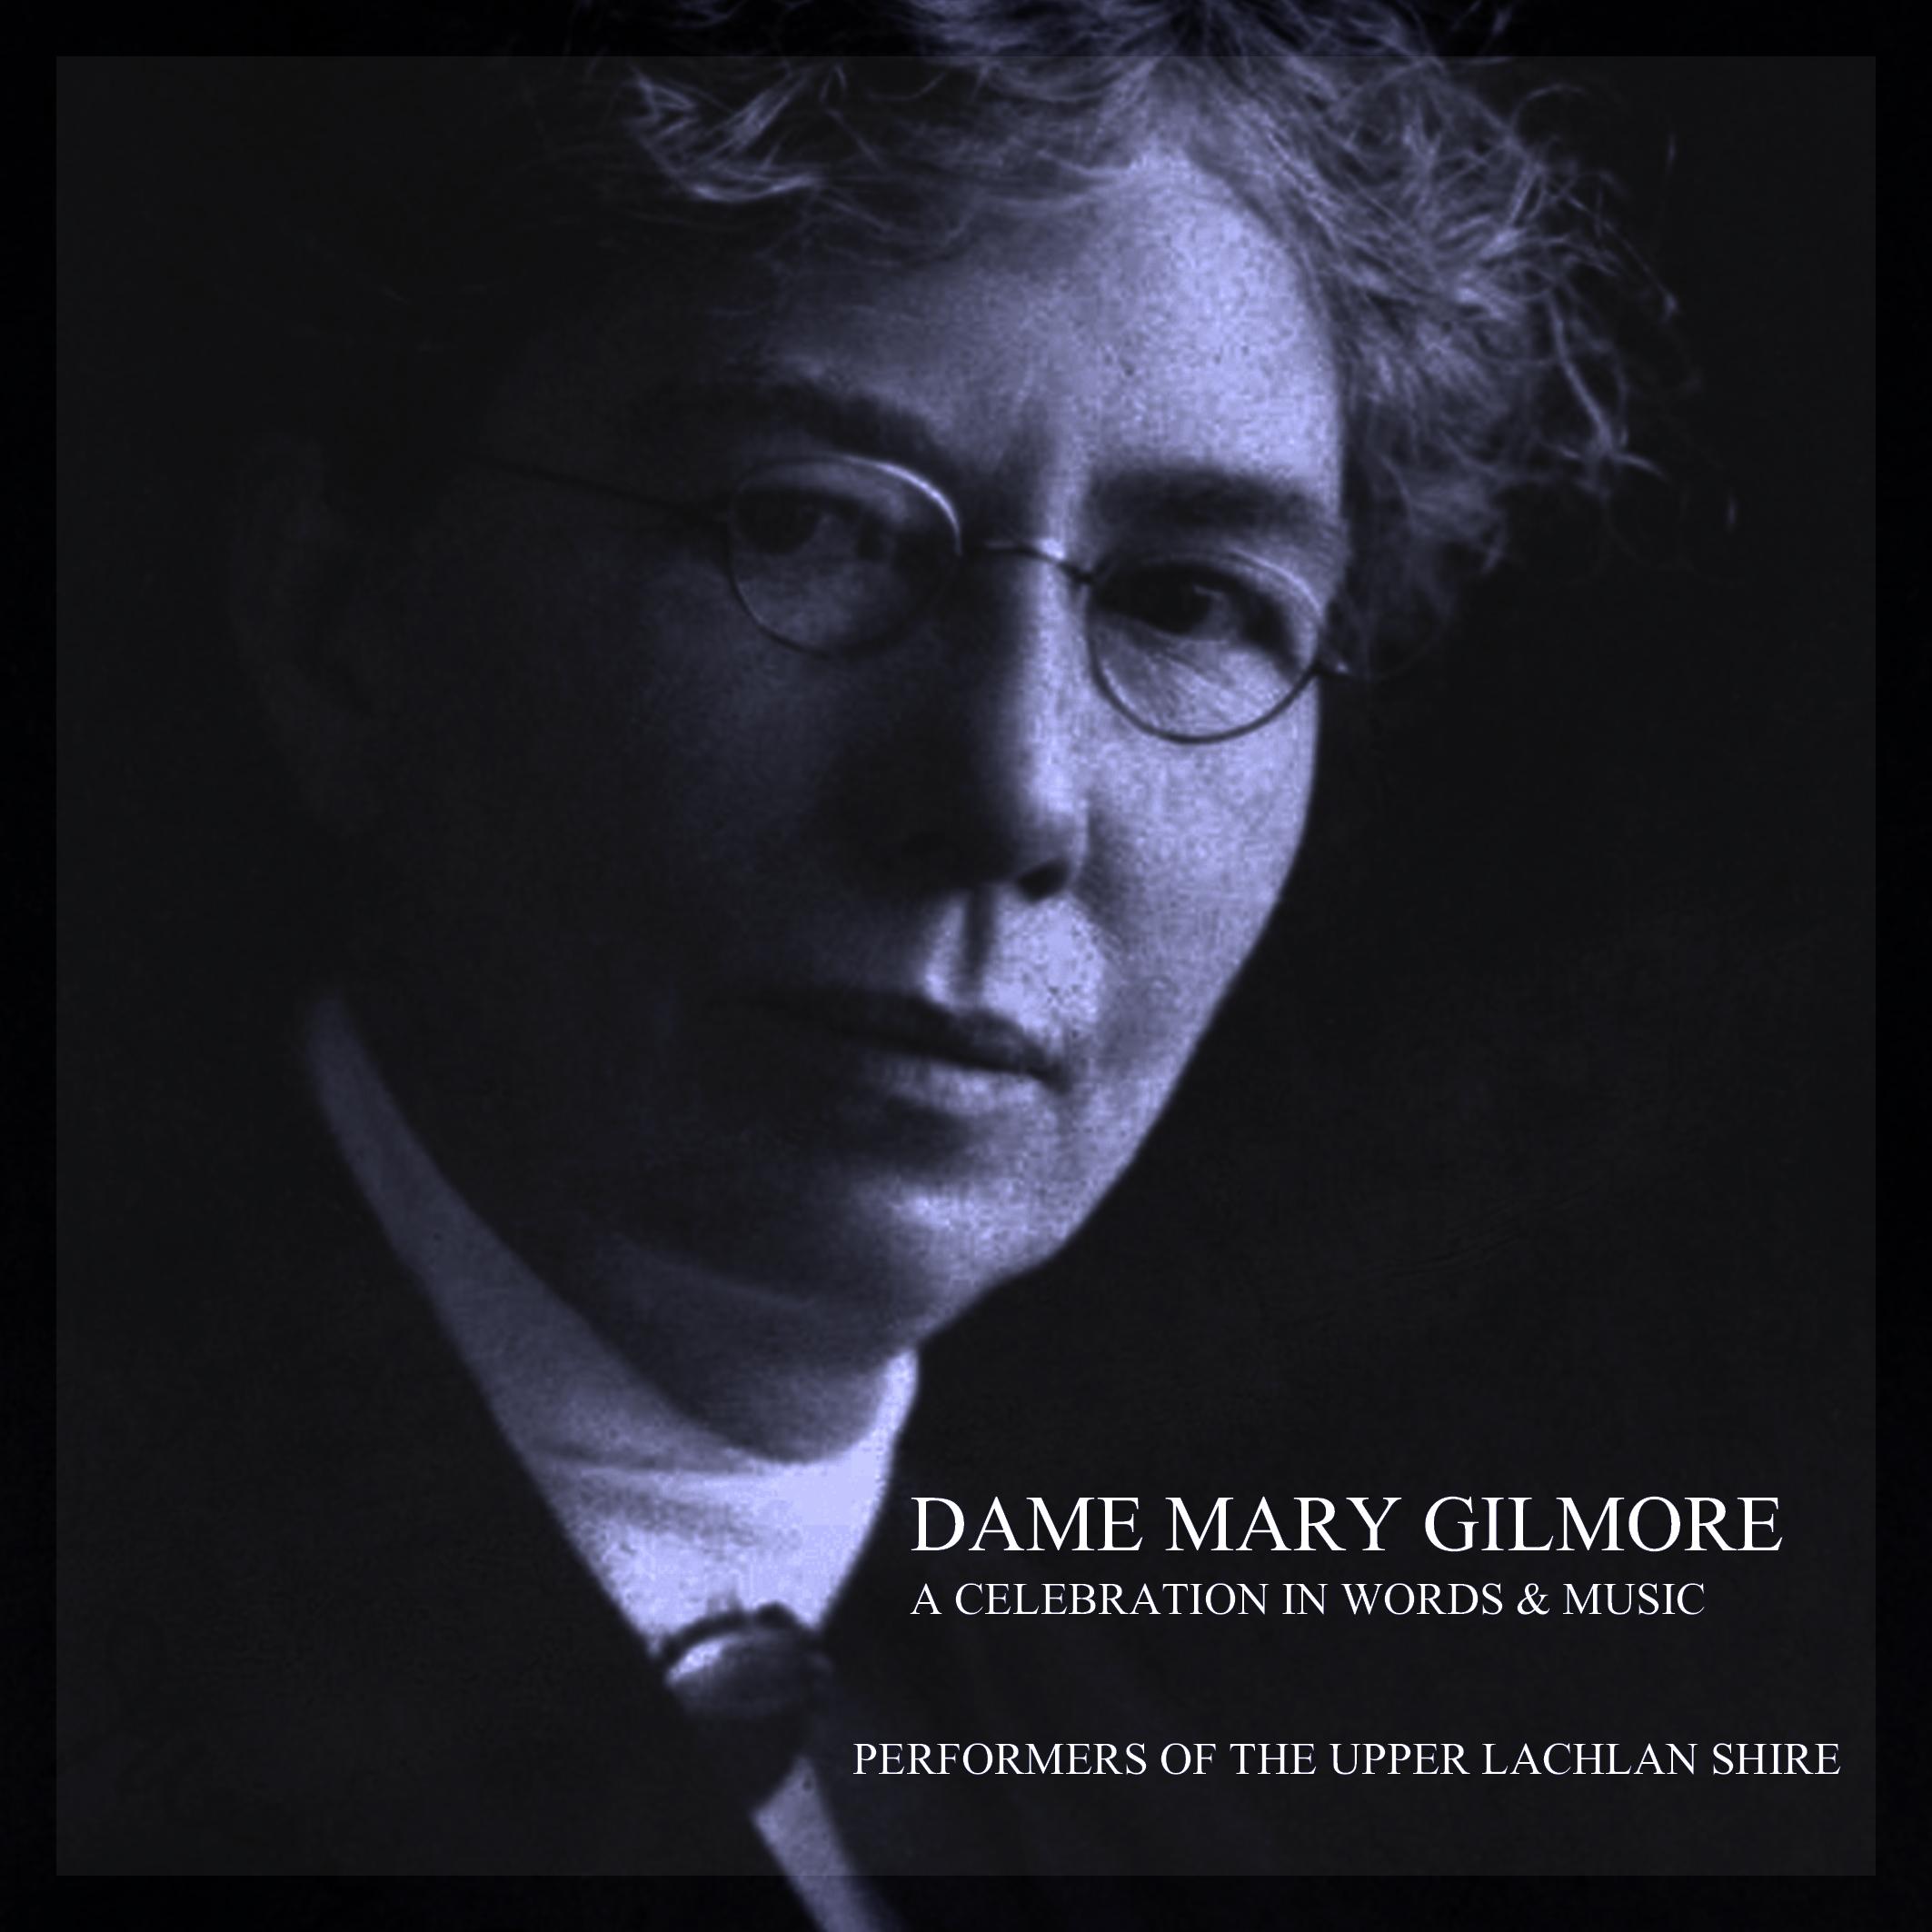 DMG_CD Cover.jpg